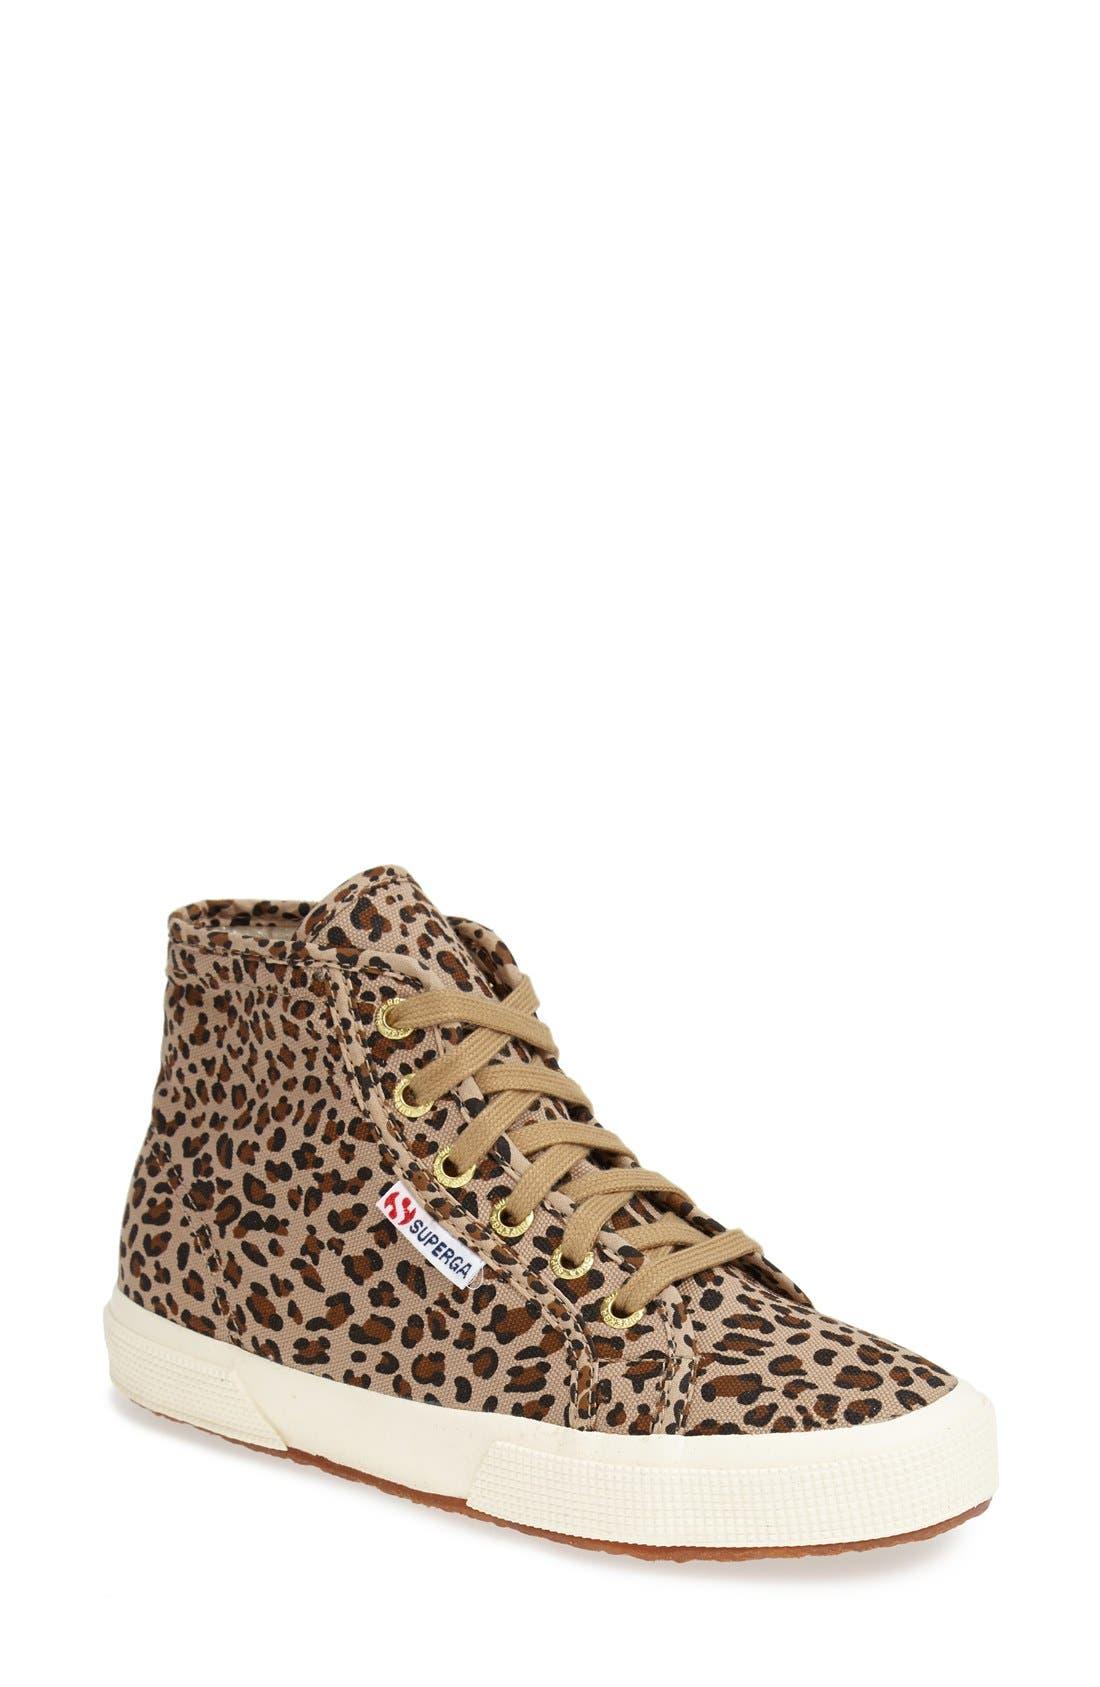 'Leo' High Top Sneaker, Main, color, 200